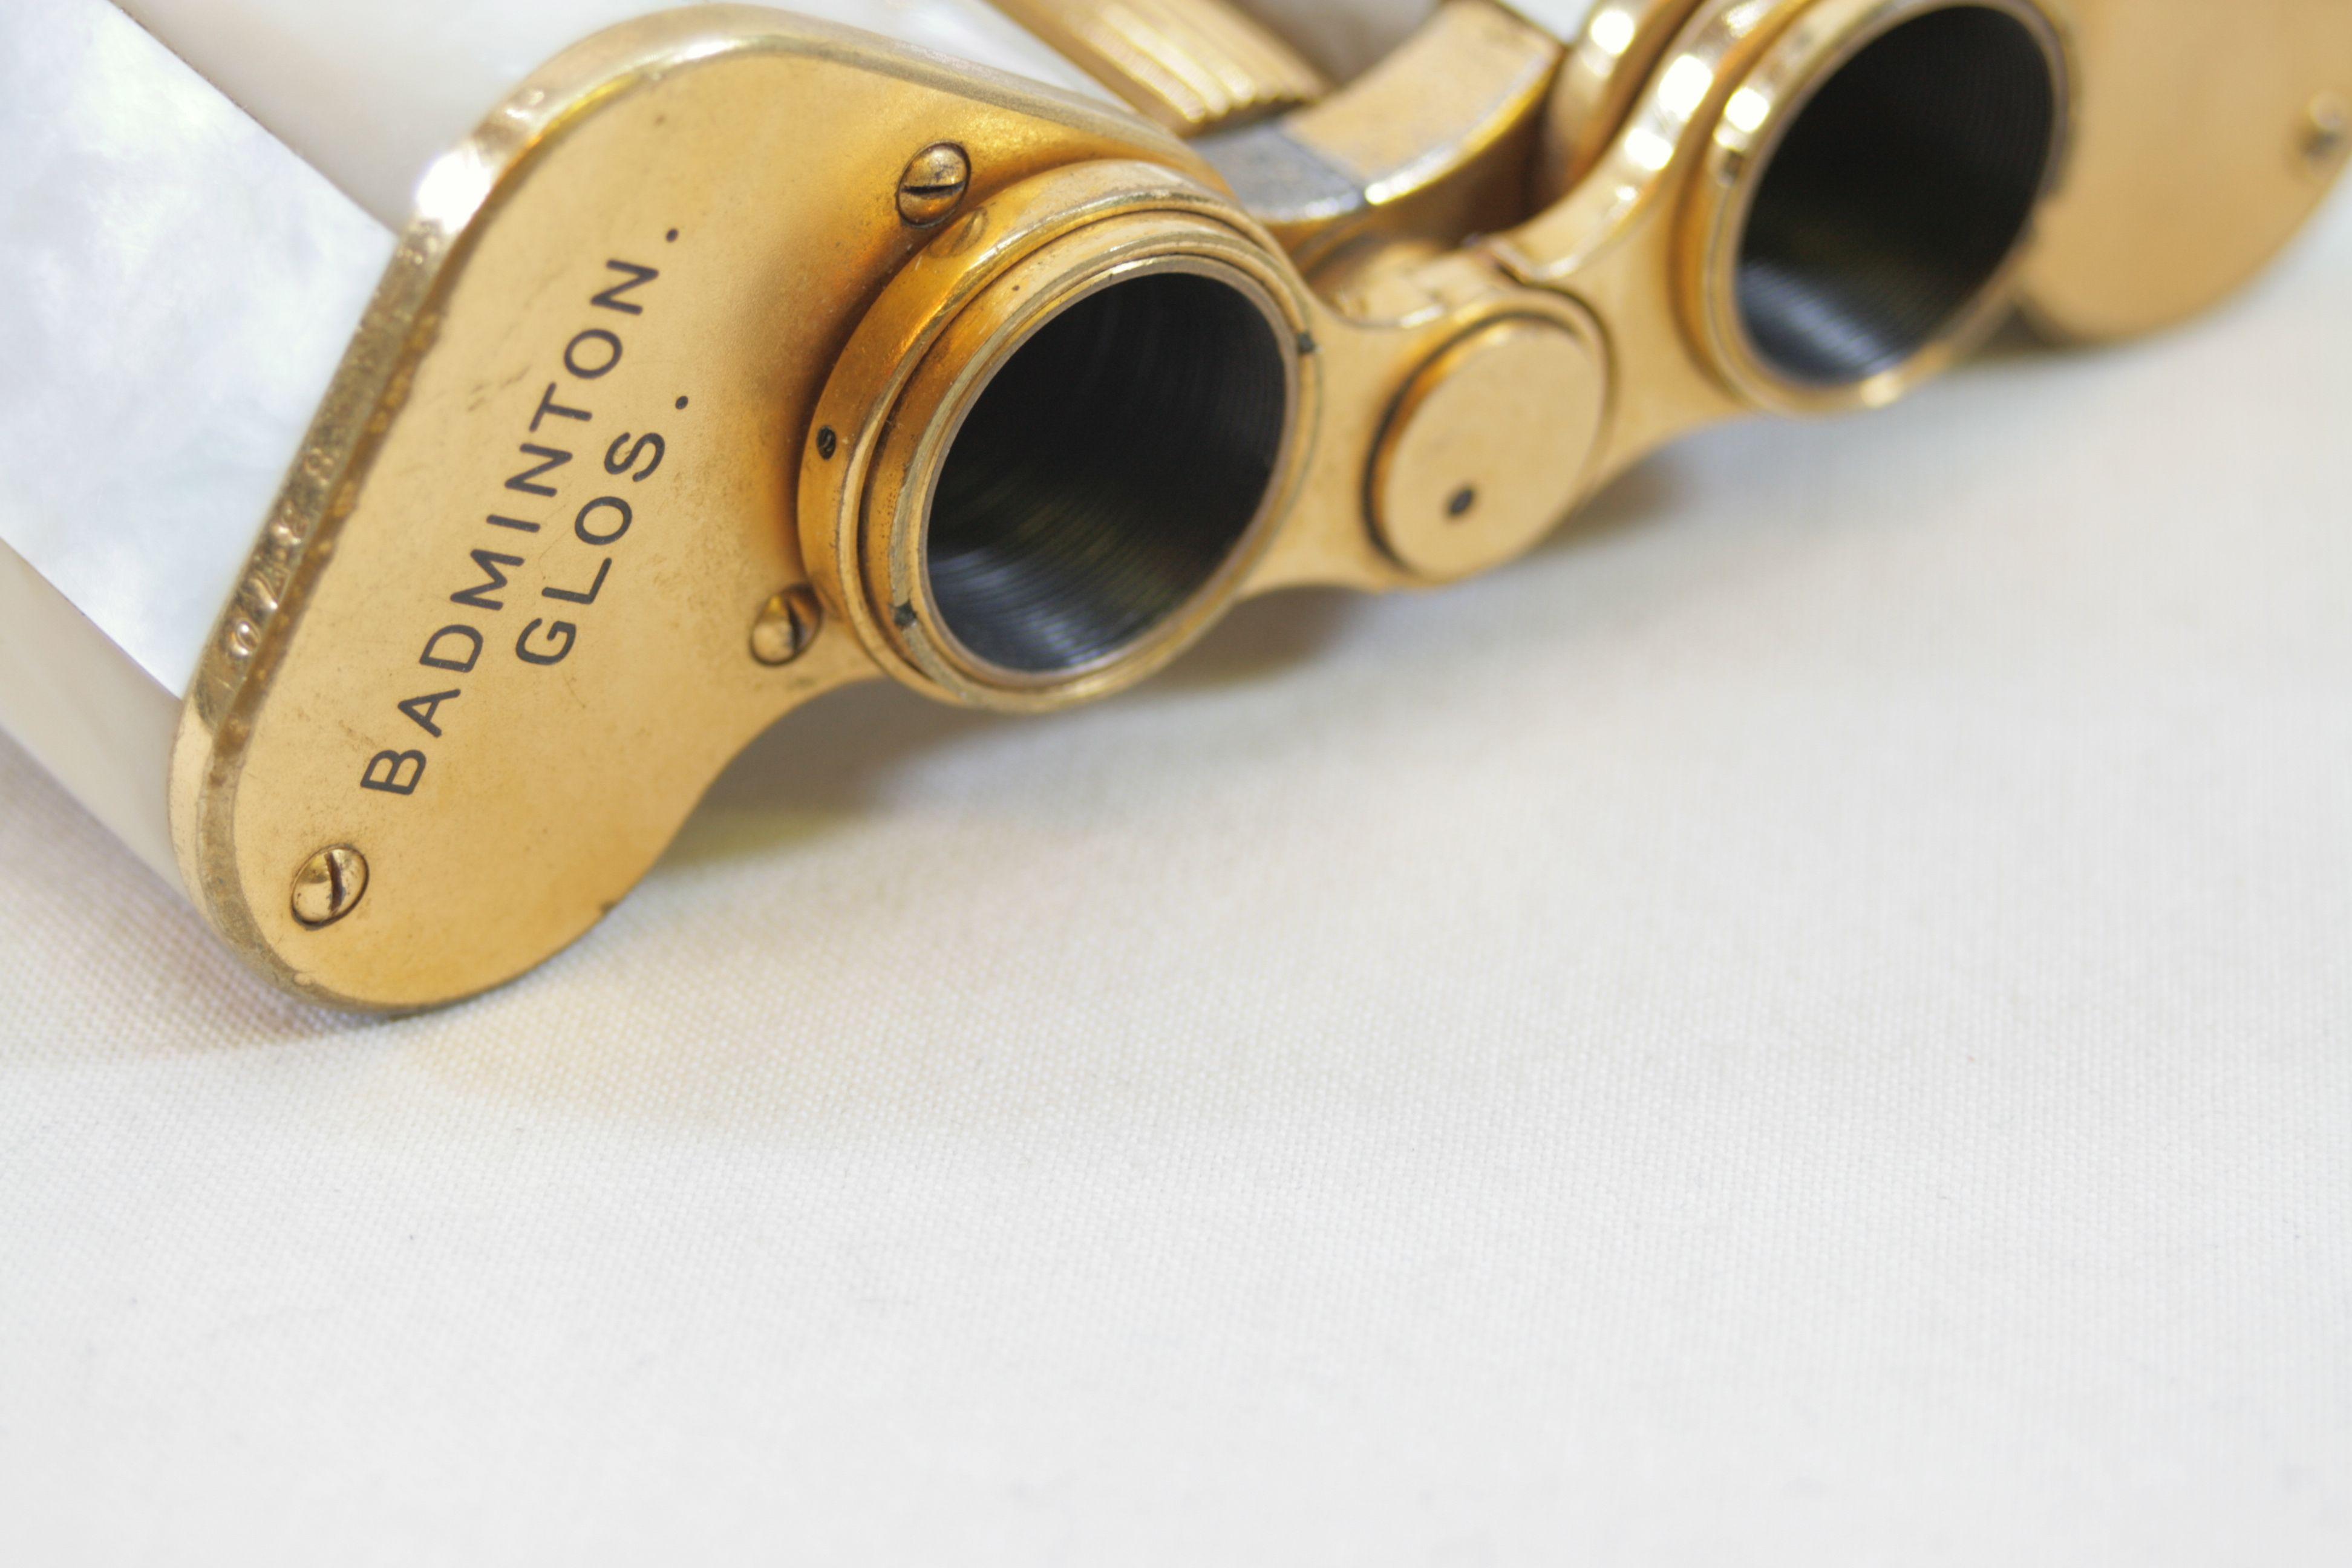 e789d00fe5a Open Full-Size Image. Carl Zeiss Jena Teleater 3 x 13.5 Prismatic Pearl  Opera Glasses   Binoculars 10